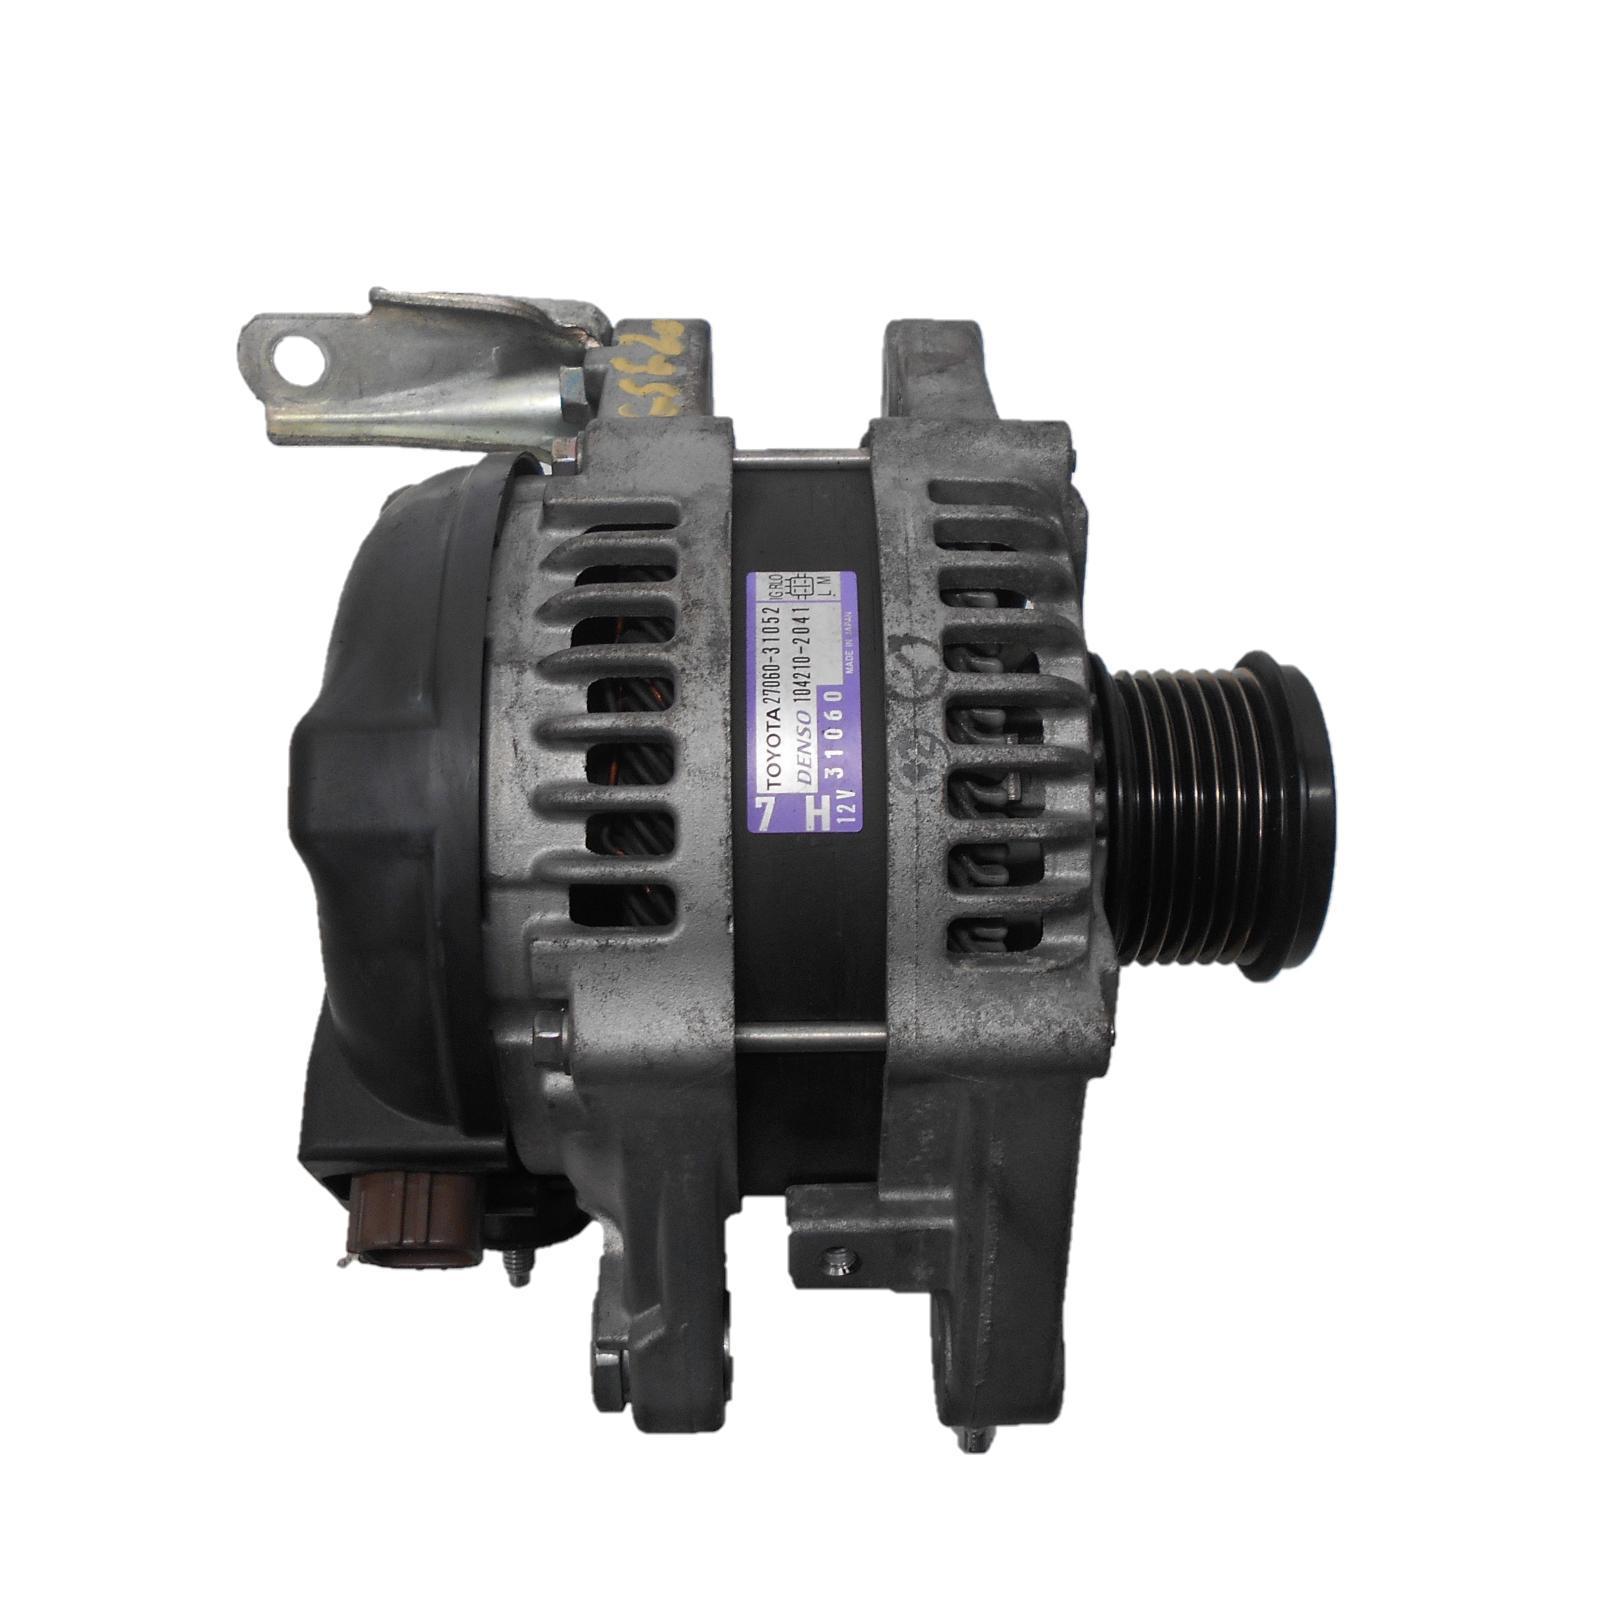 LEXUS IS250/IS250C, Alternator, IS250/IS250C, 2.5, 4GR, GSE20R, 11/05-12/14